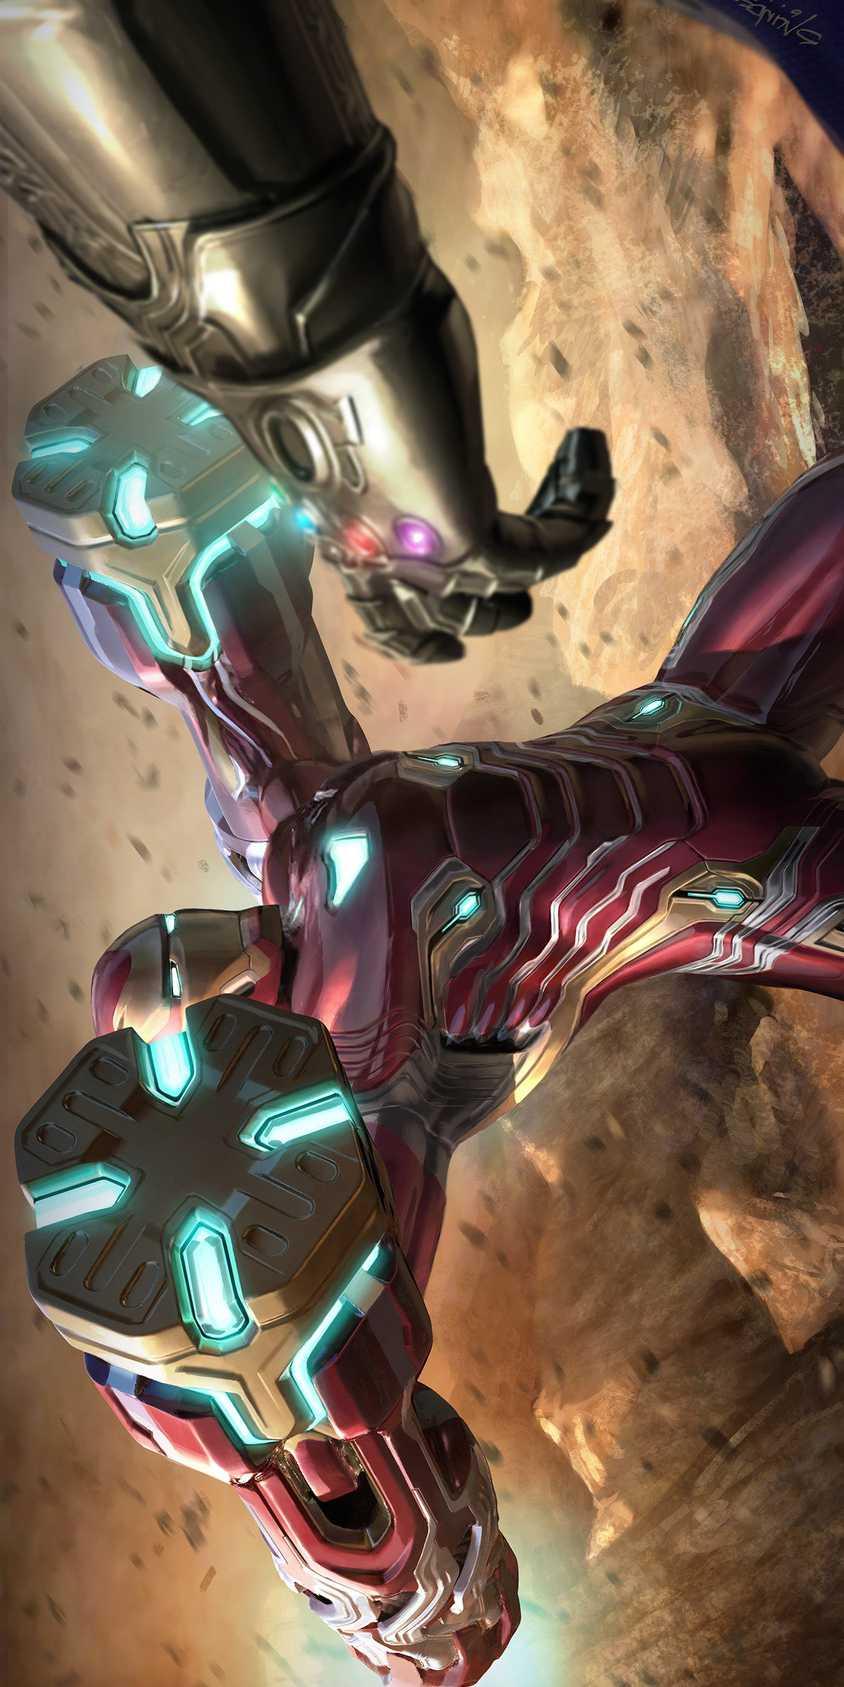 Avengers Endgame Iron Man vs Thanos iPhone Wallpaper 1